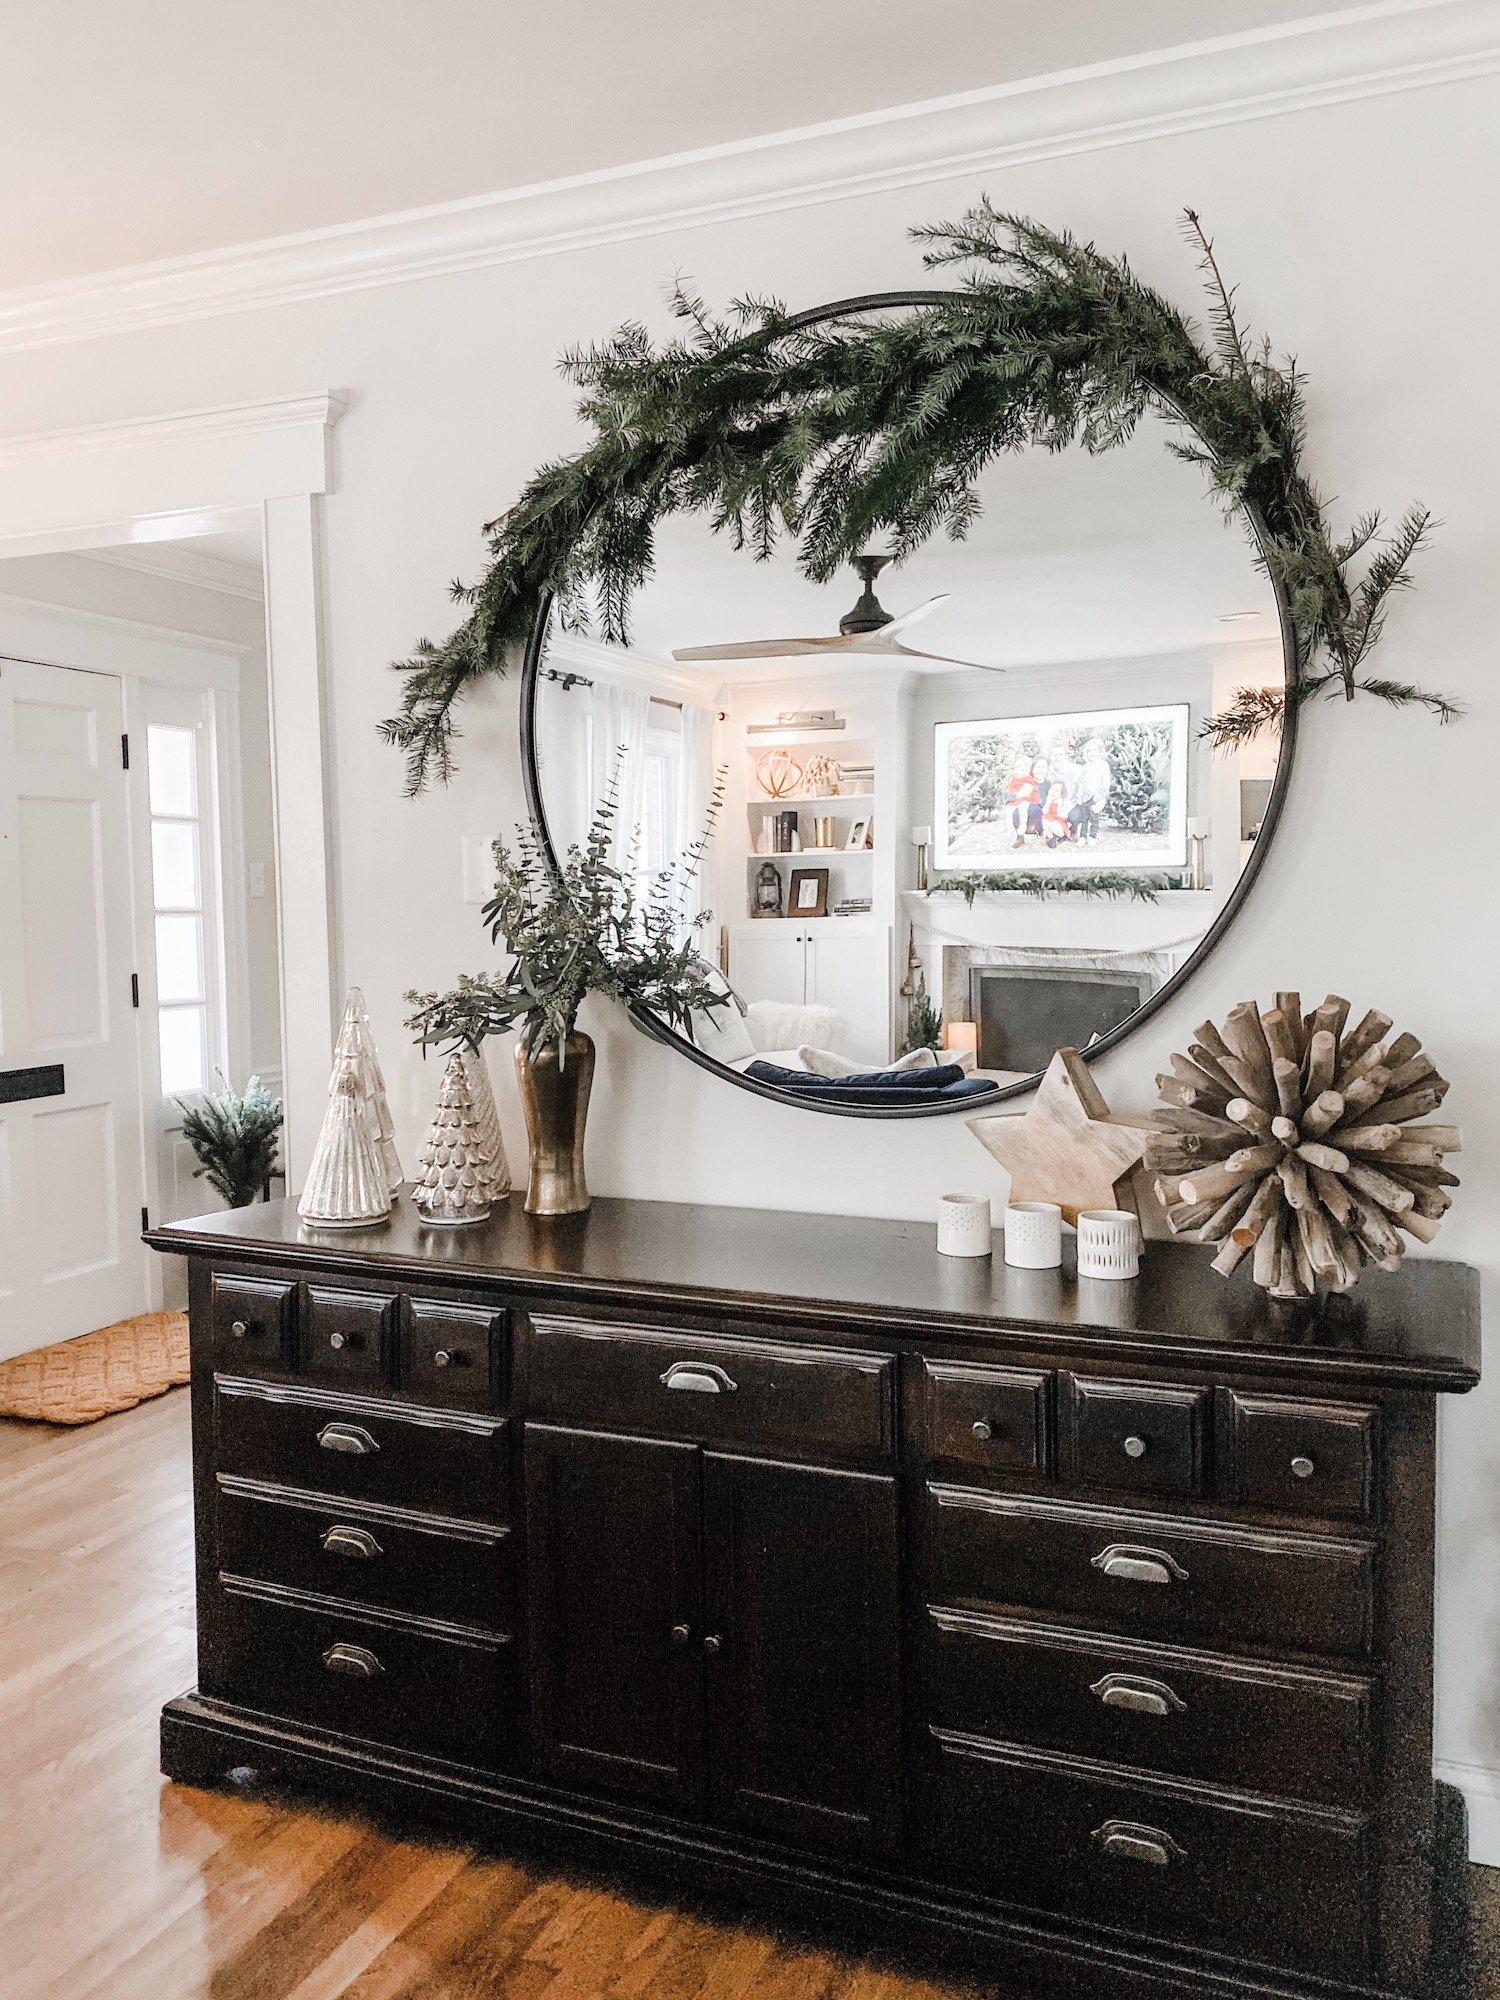 Buffet Christmas Decor